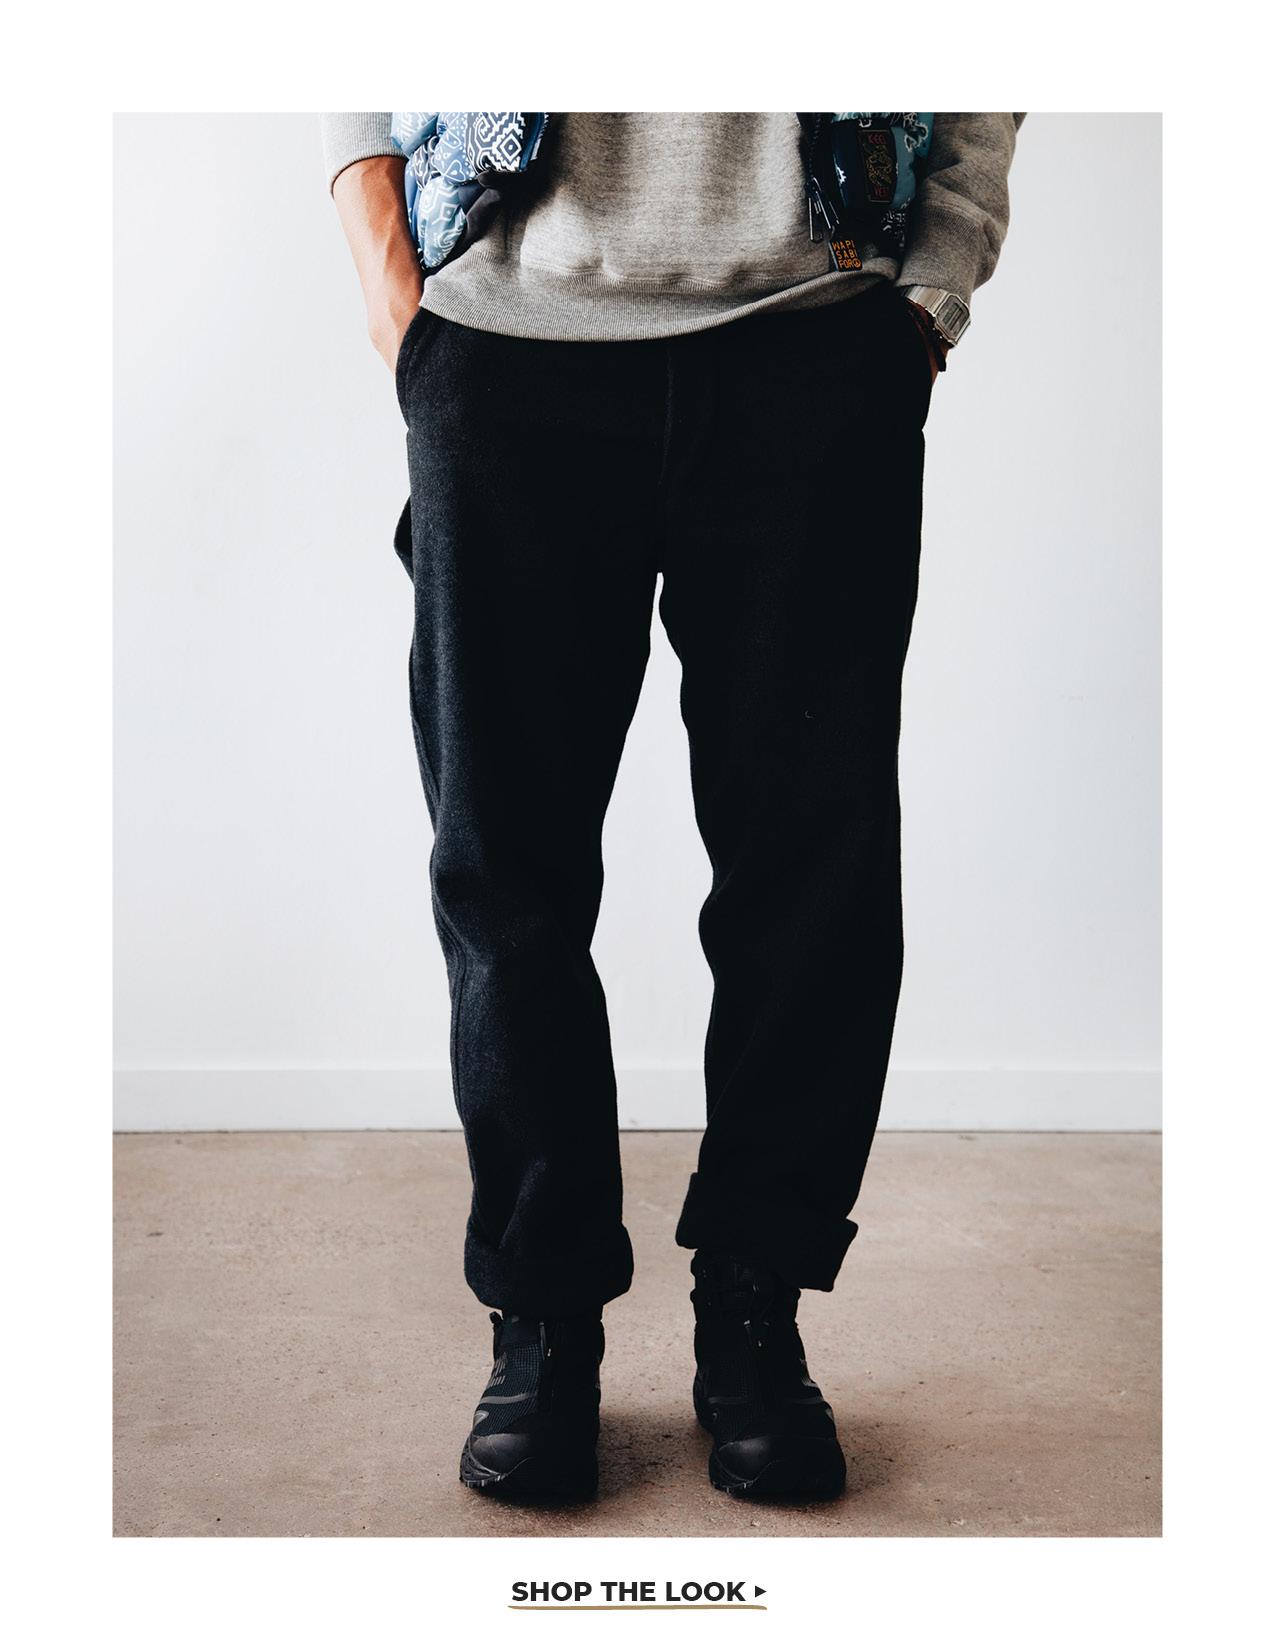 kapital bandana print nylon keel-weaving vest, orslow hooded sweatshirt, orslow french work pants, and new balance tokyo design studio niobium boots on body